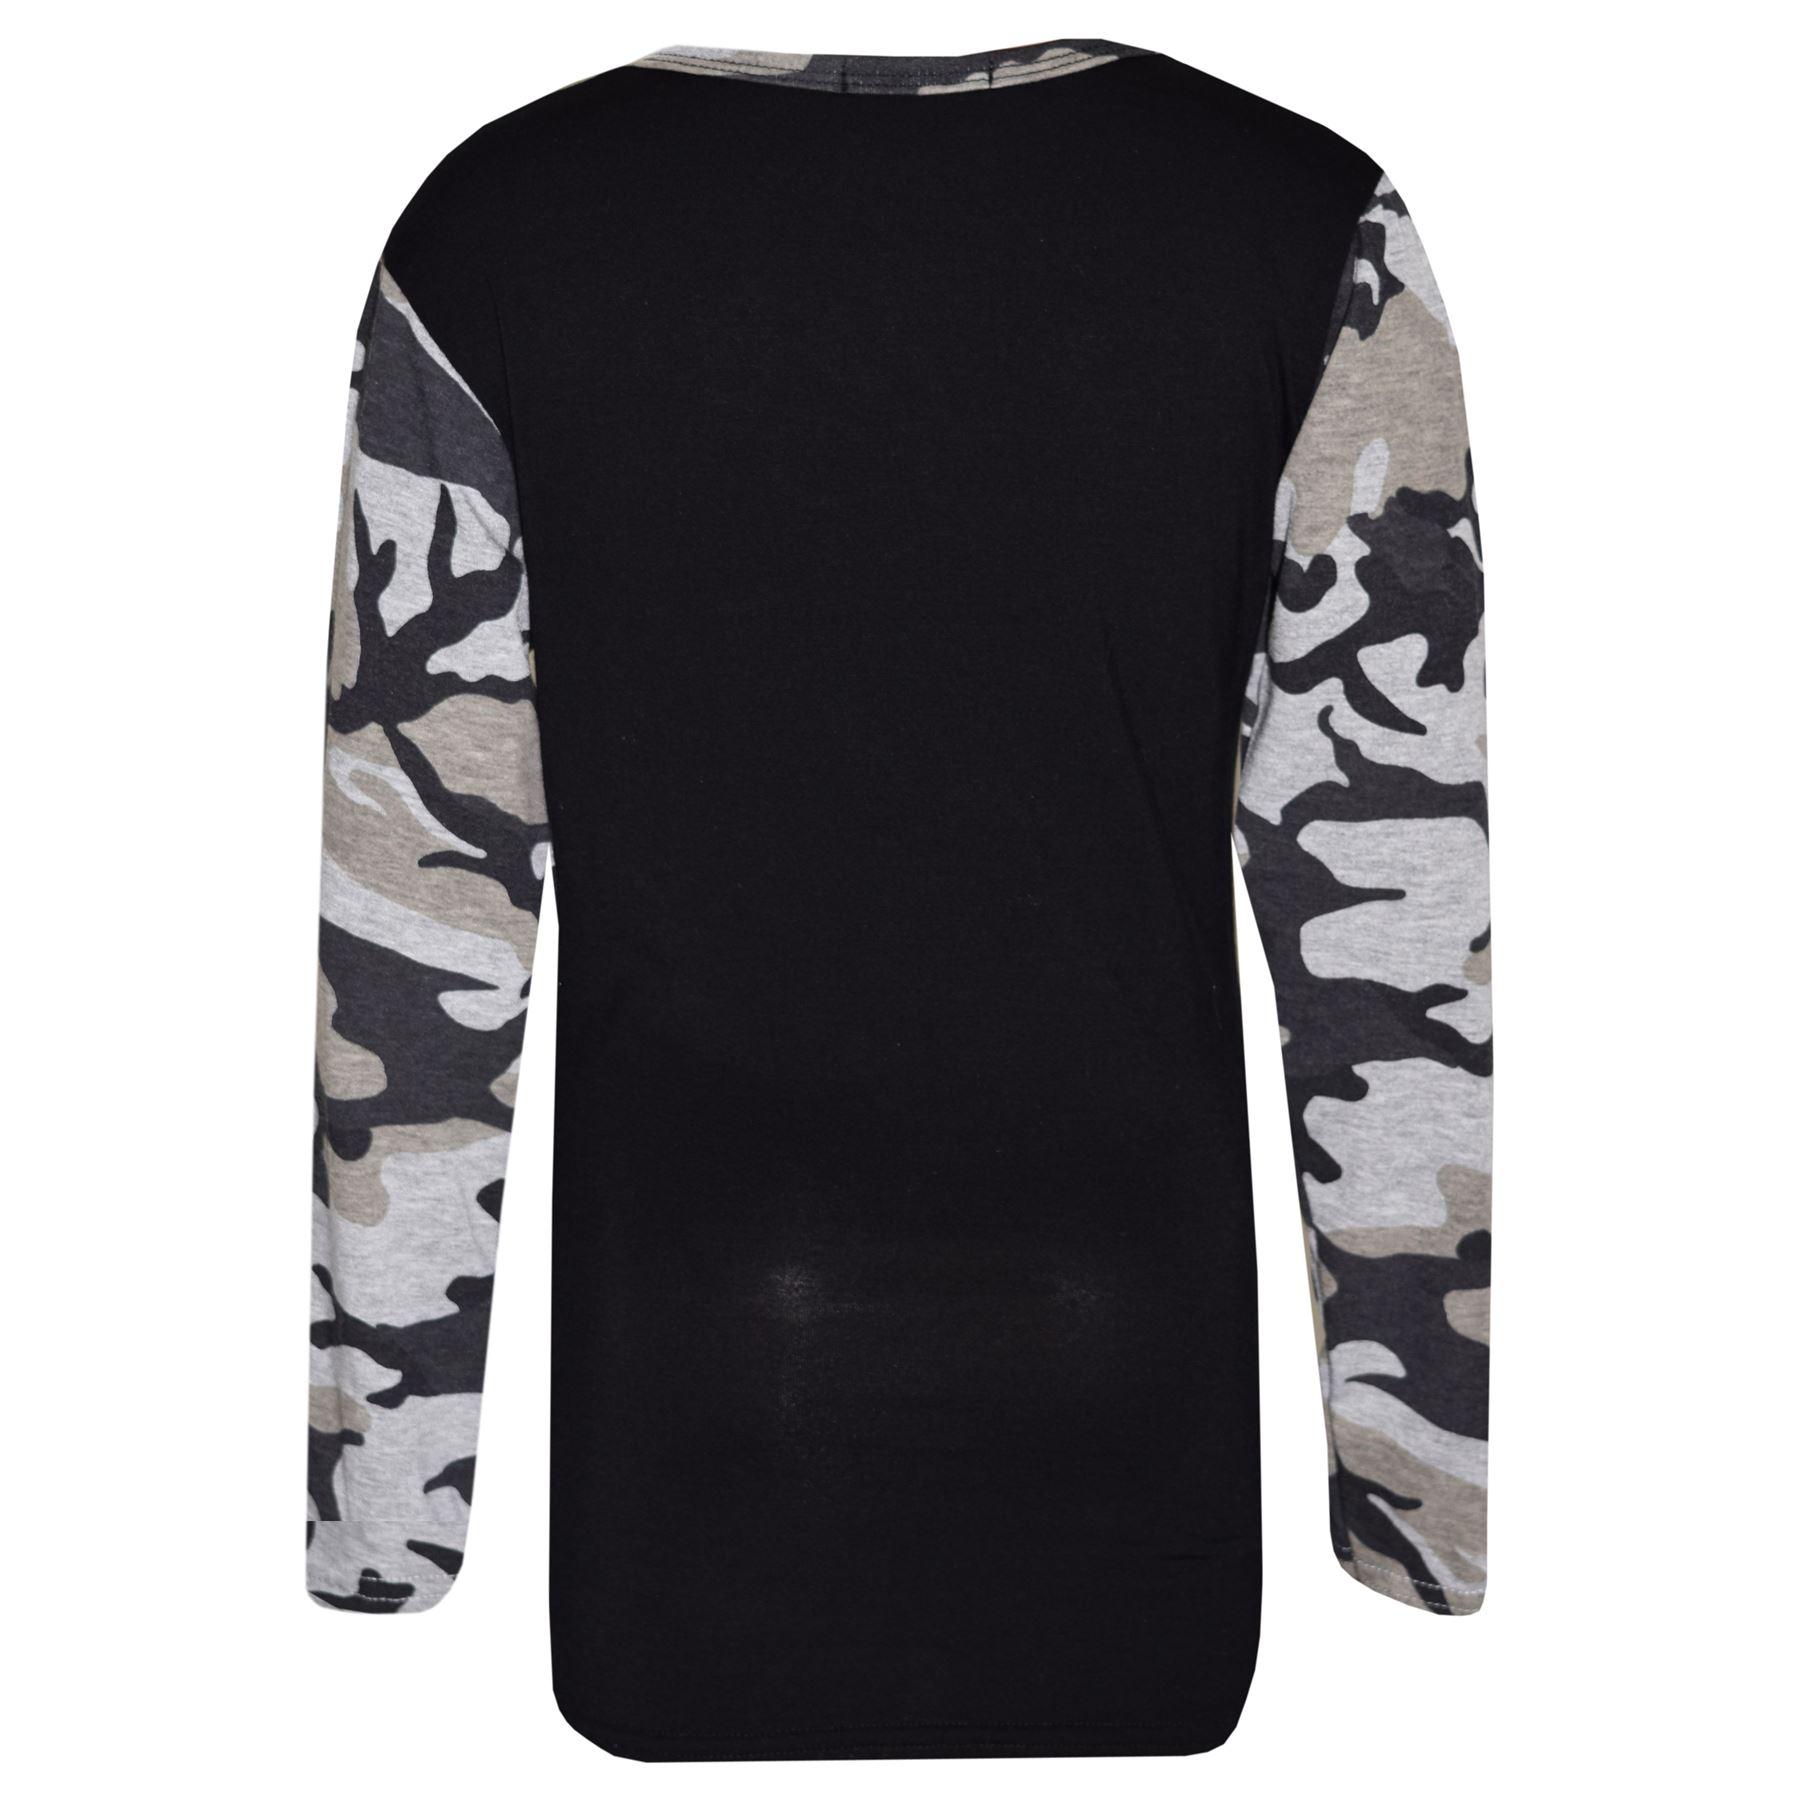 b802b2af0057 Girls Tops Kids Girl Boss Camouflage Print T Shirt Top   Legging Set ...